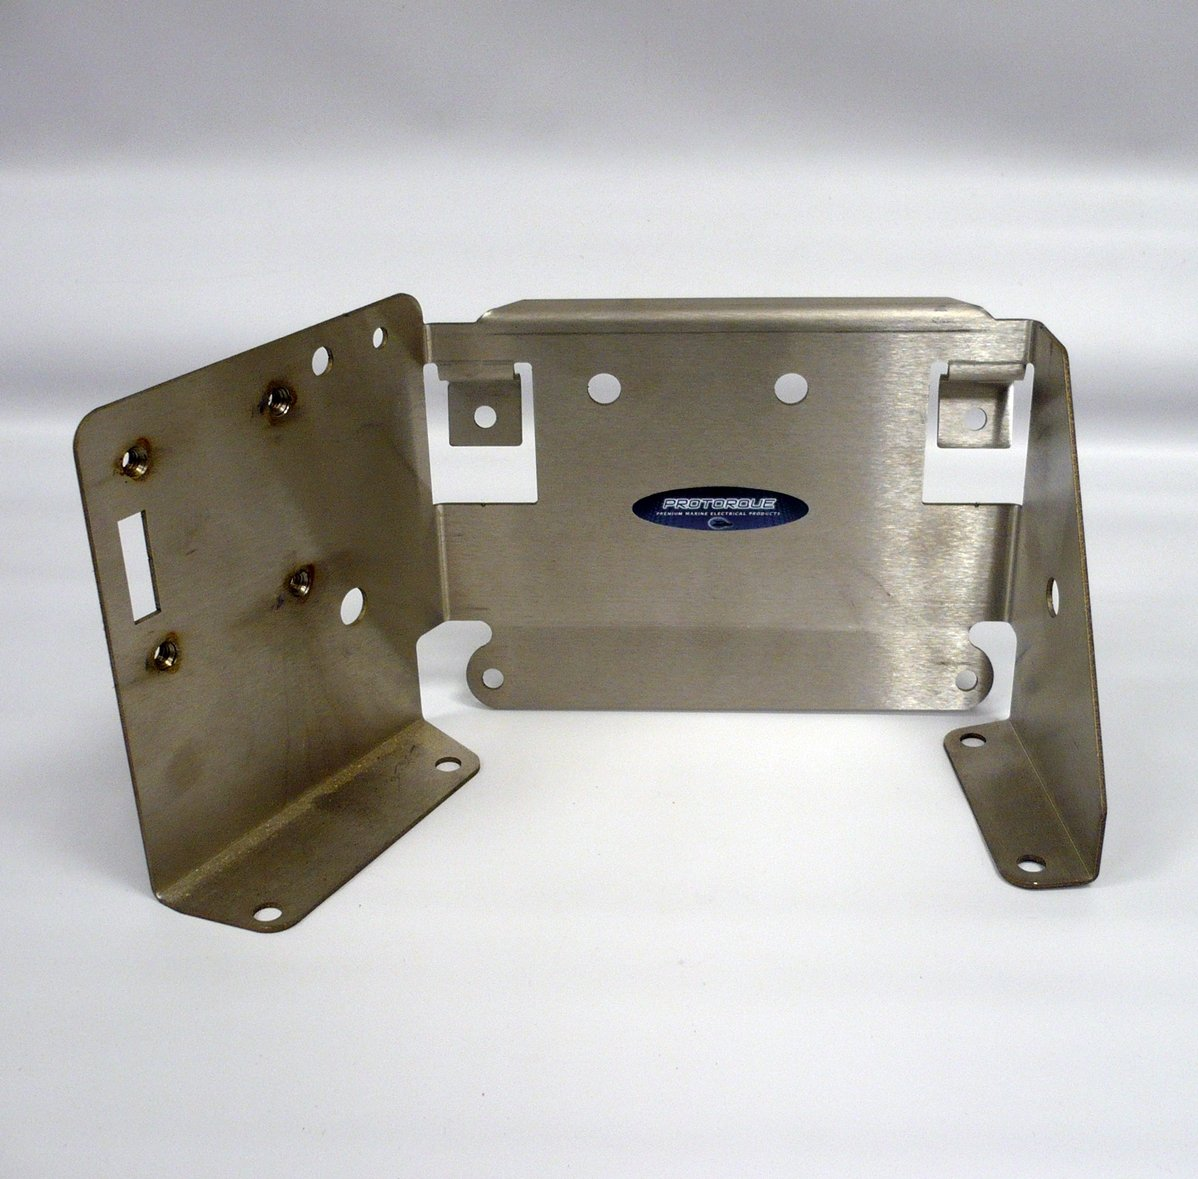 Mercury Trim Motor Powder Stainless Steel Bracket for Late Style Mercury WSM PH200-T067 OEM# 862548A1